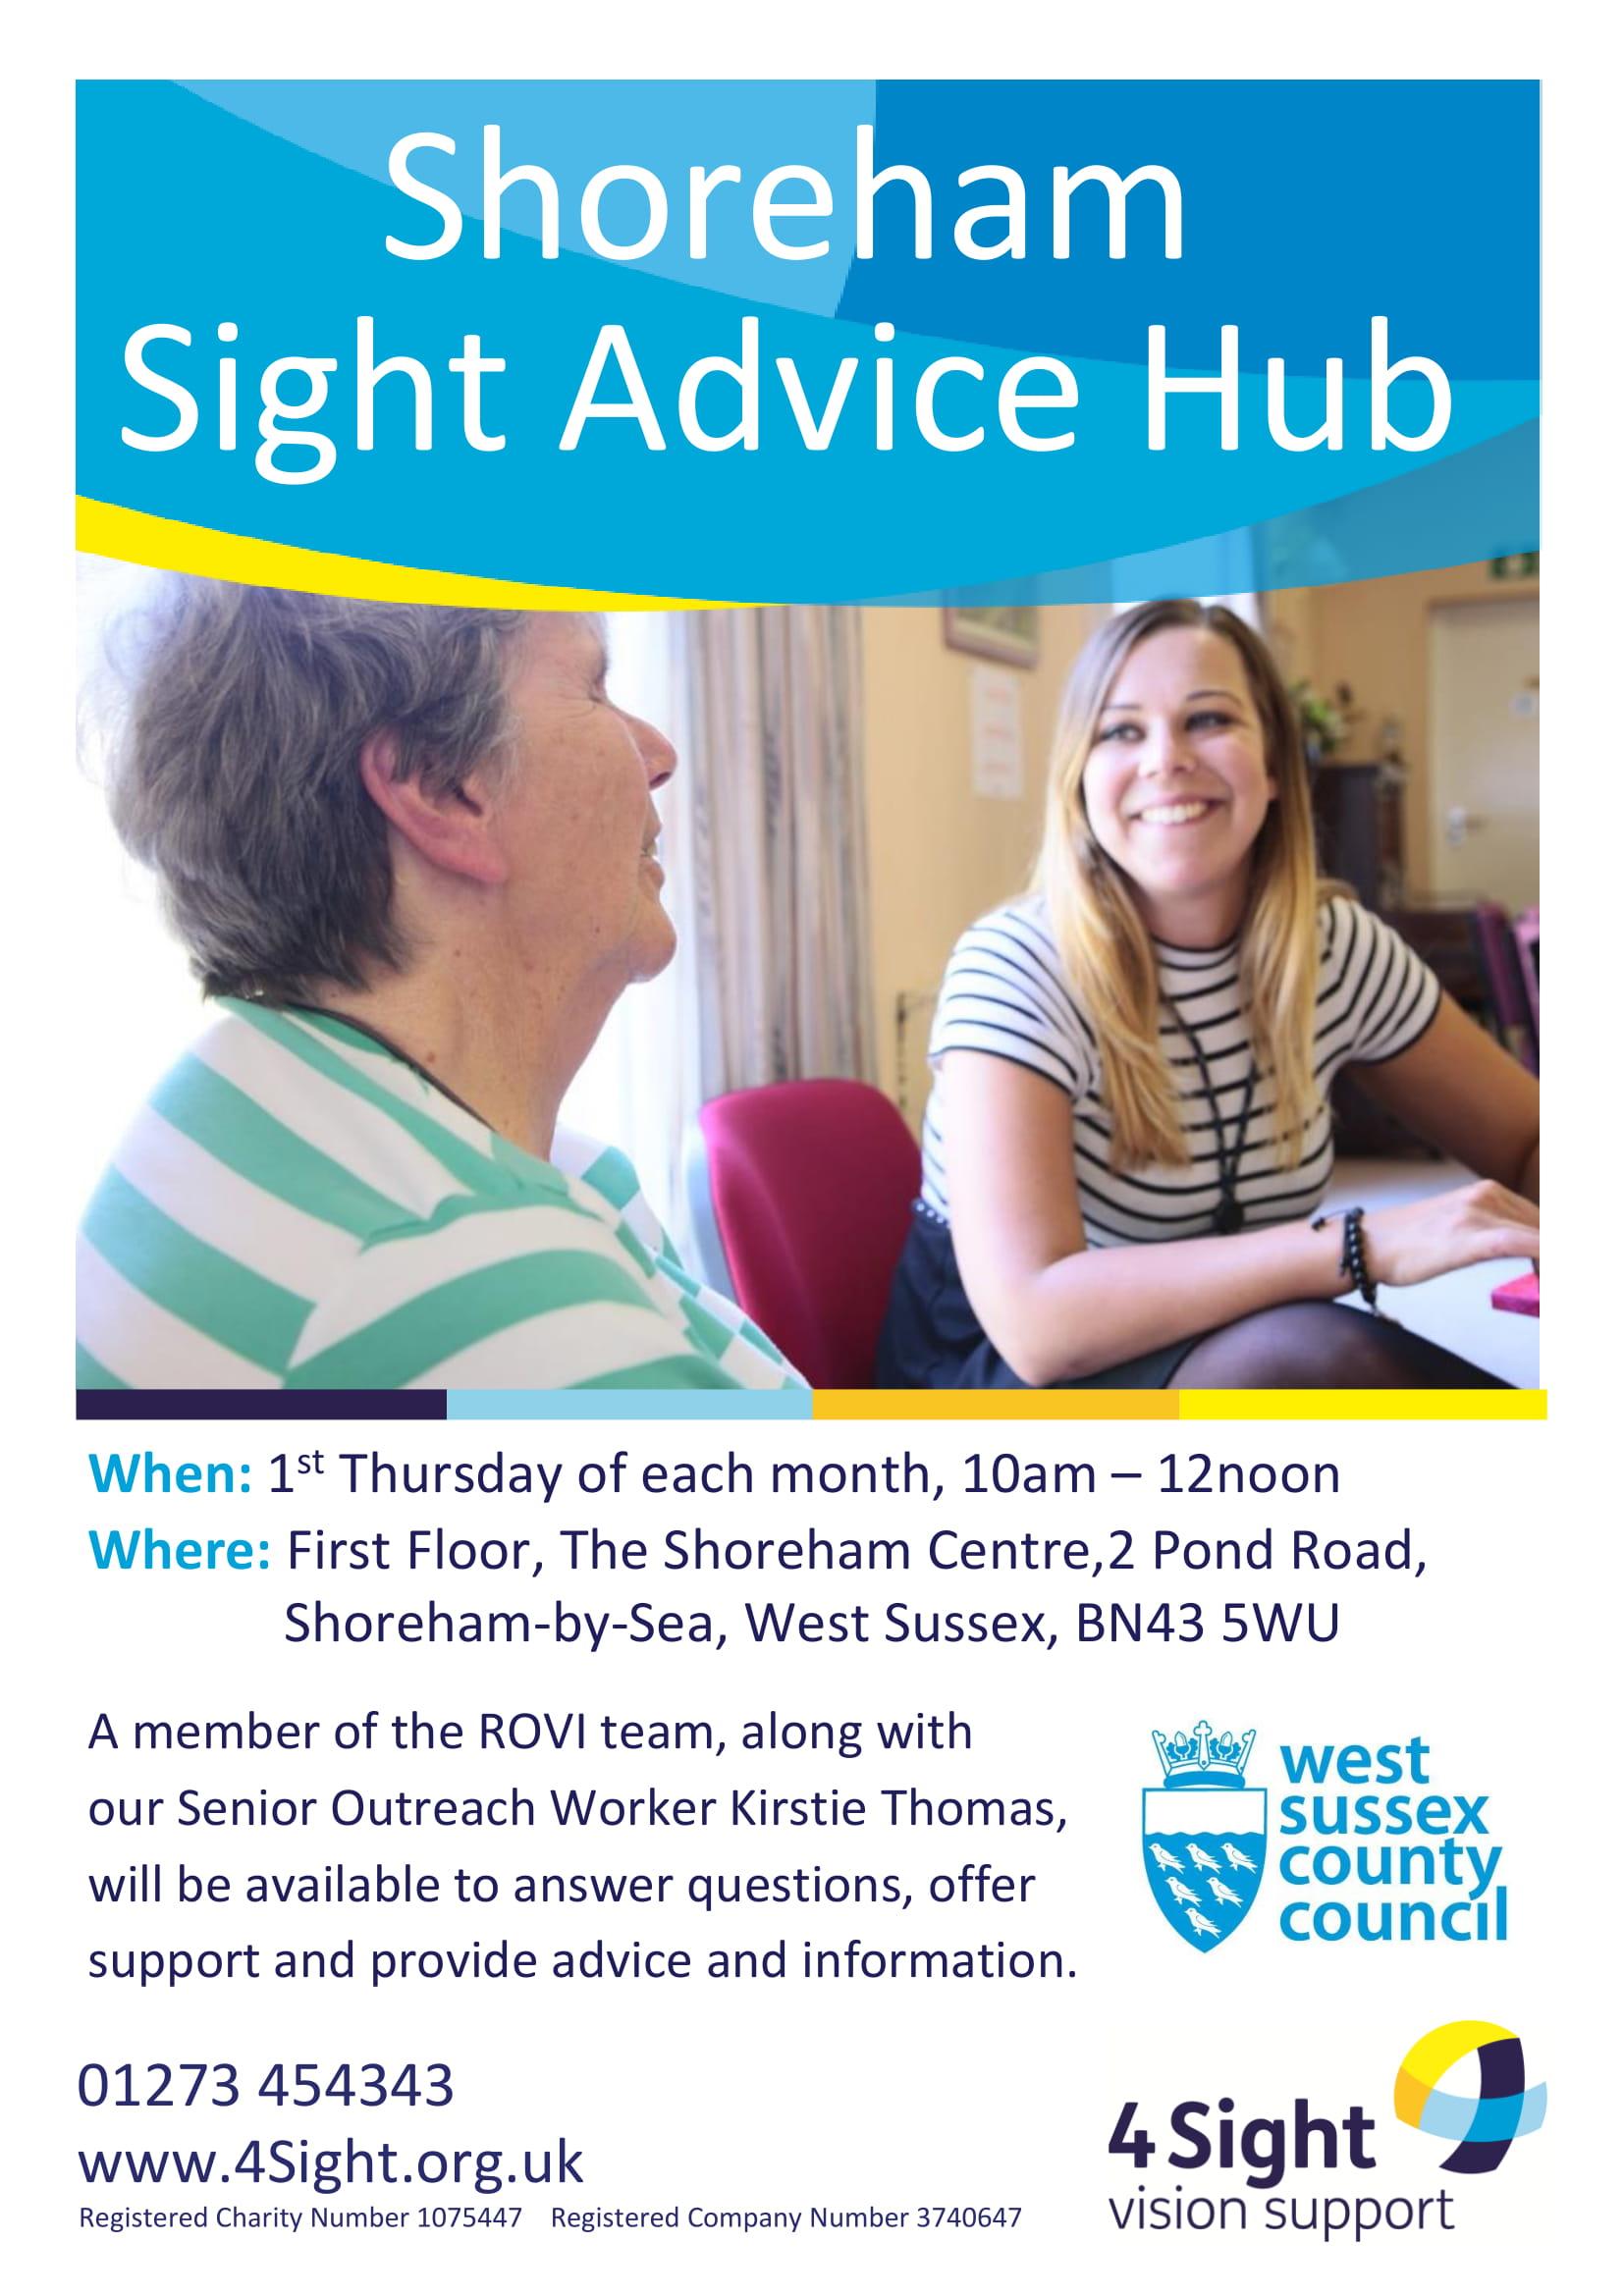 Shoreham SIght Advice Hub-1